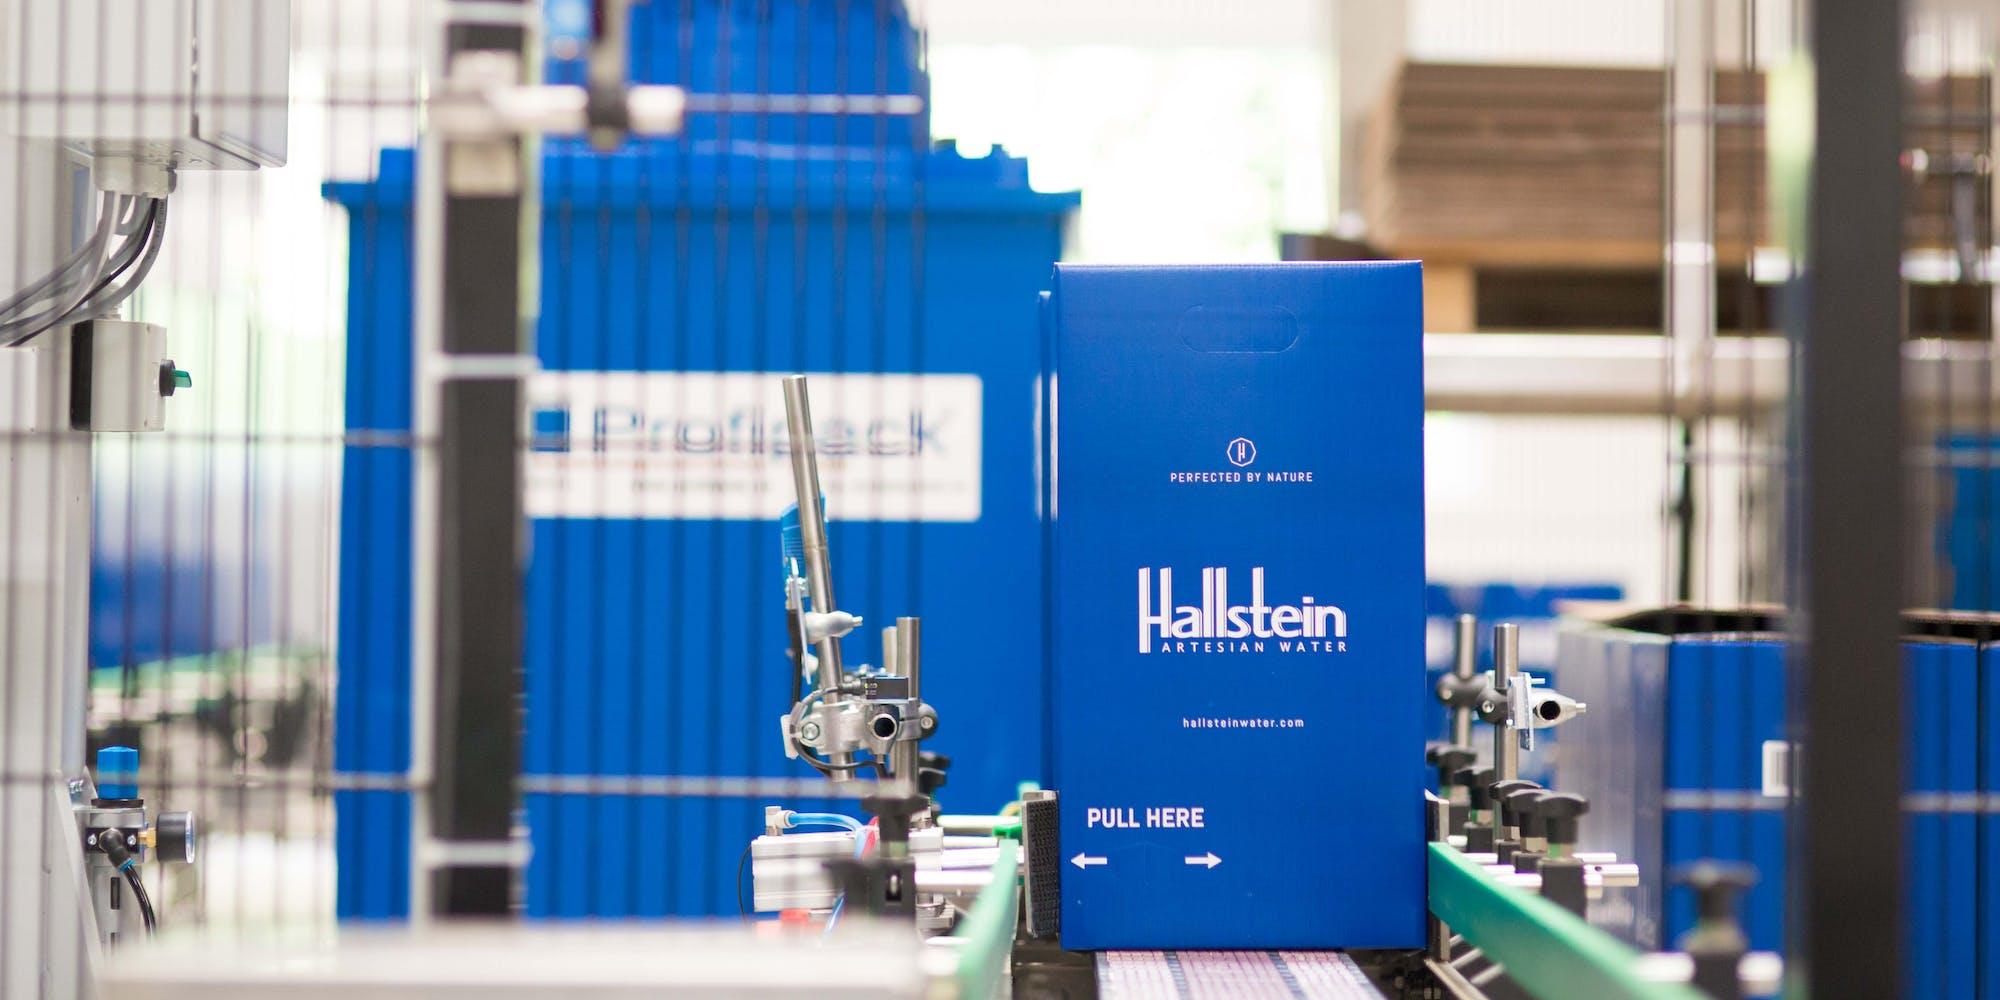 Hallstein bottle packaging in the factory in Obertraun, Austria.